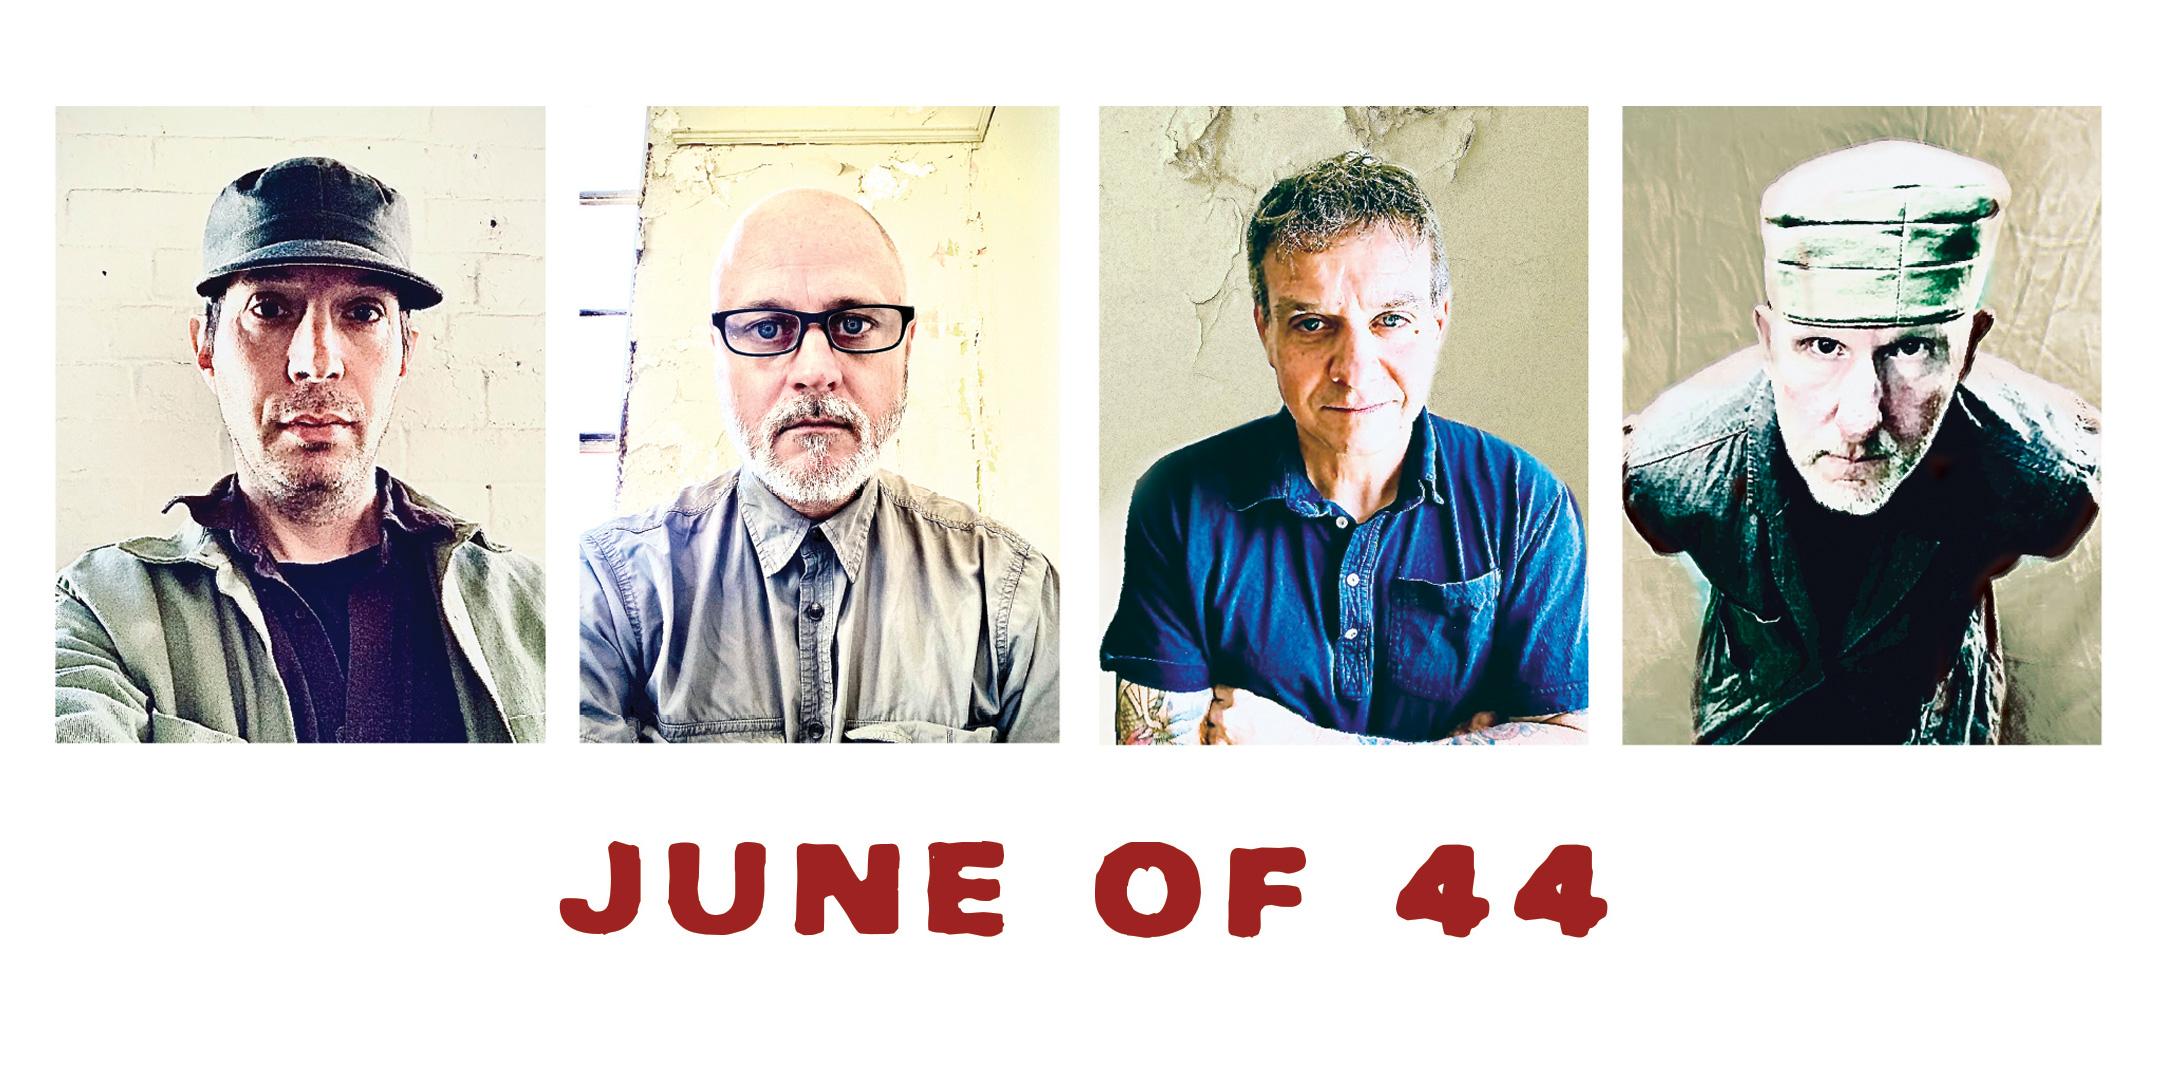 June of 44